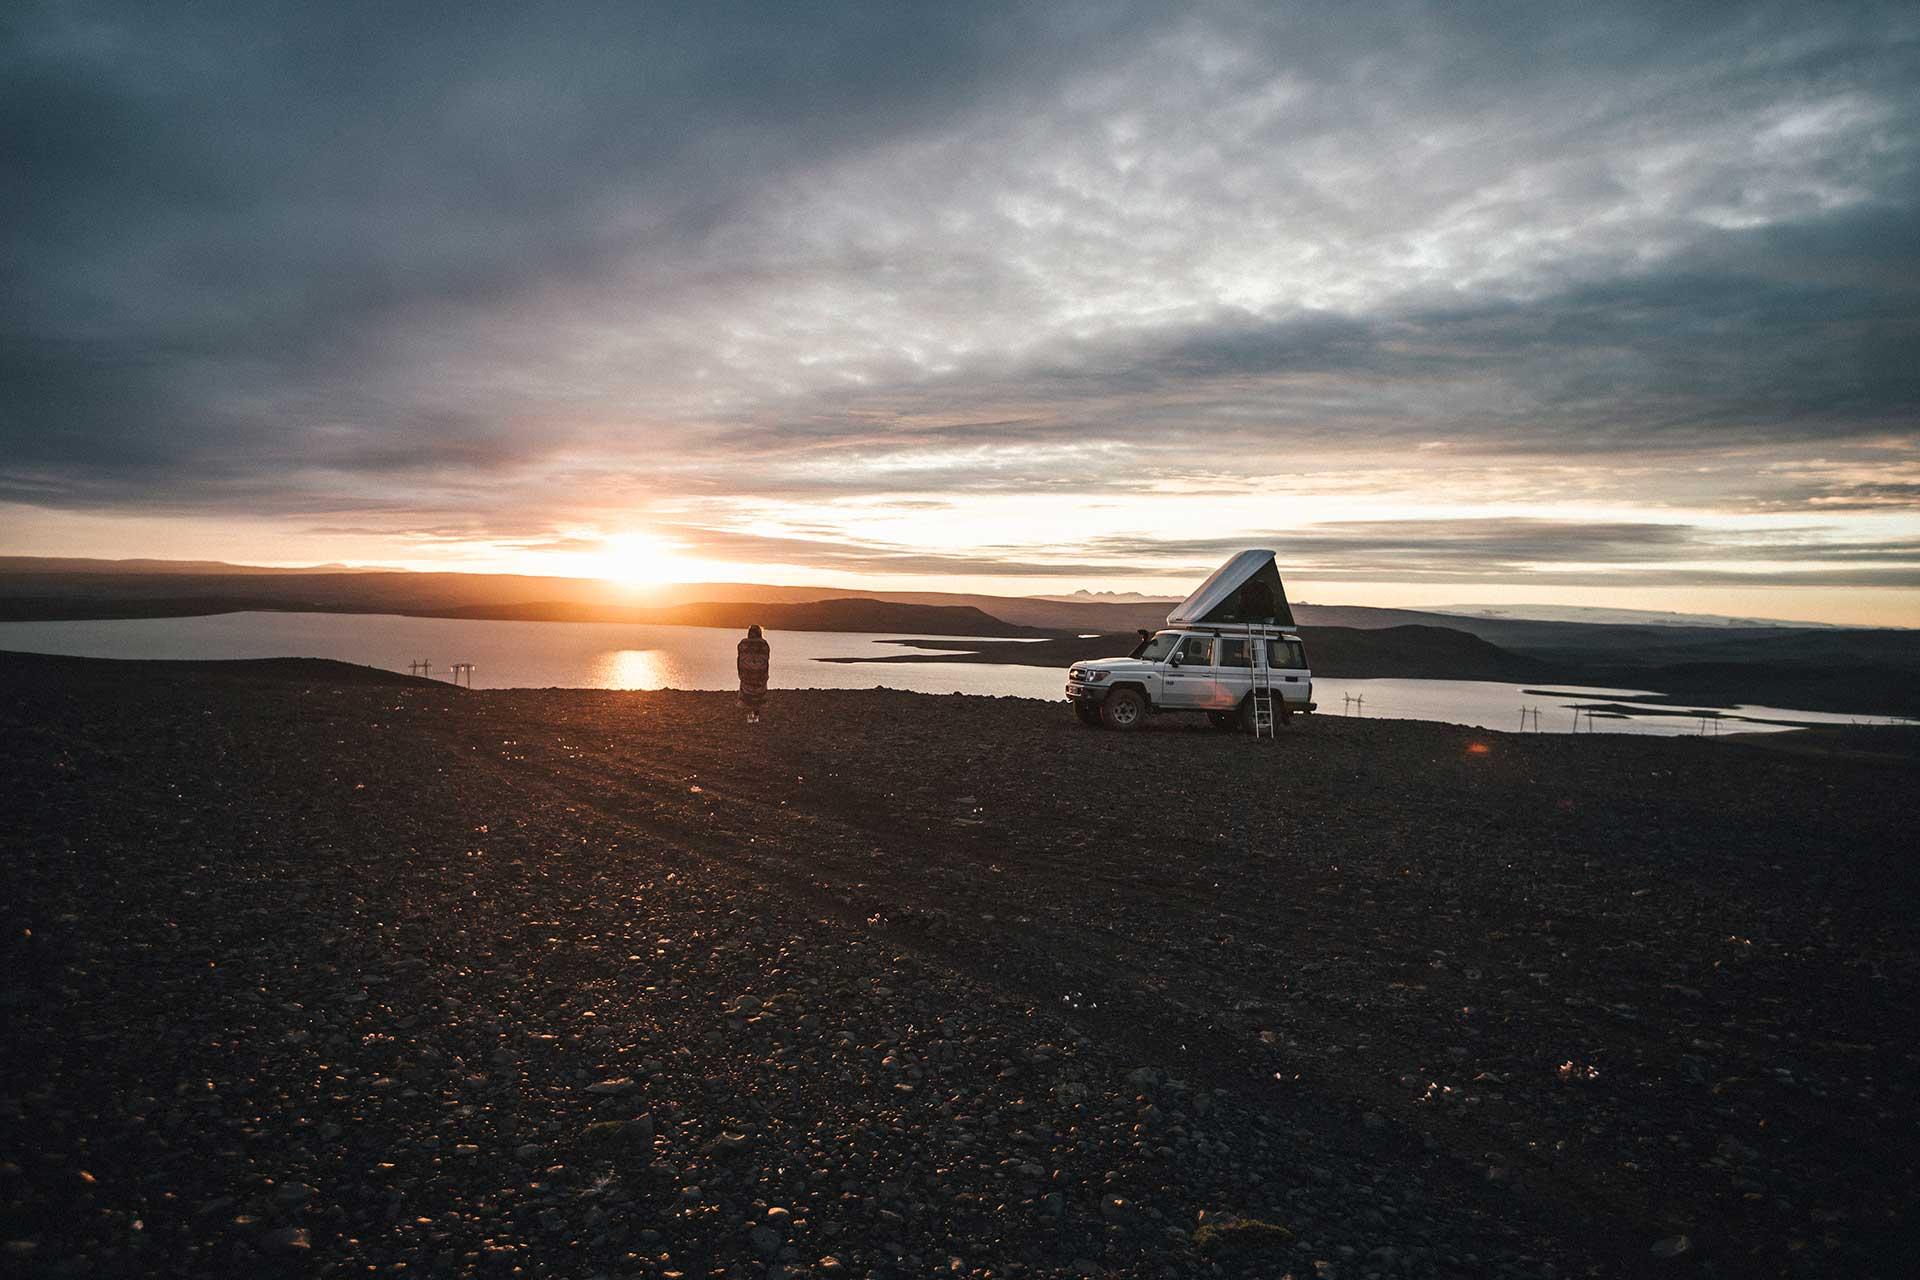 Fotoproduktion Landcruiser Travel Vanlife Camping Island Engelhorn Michael Müller